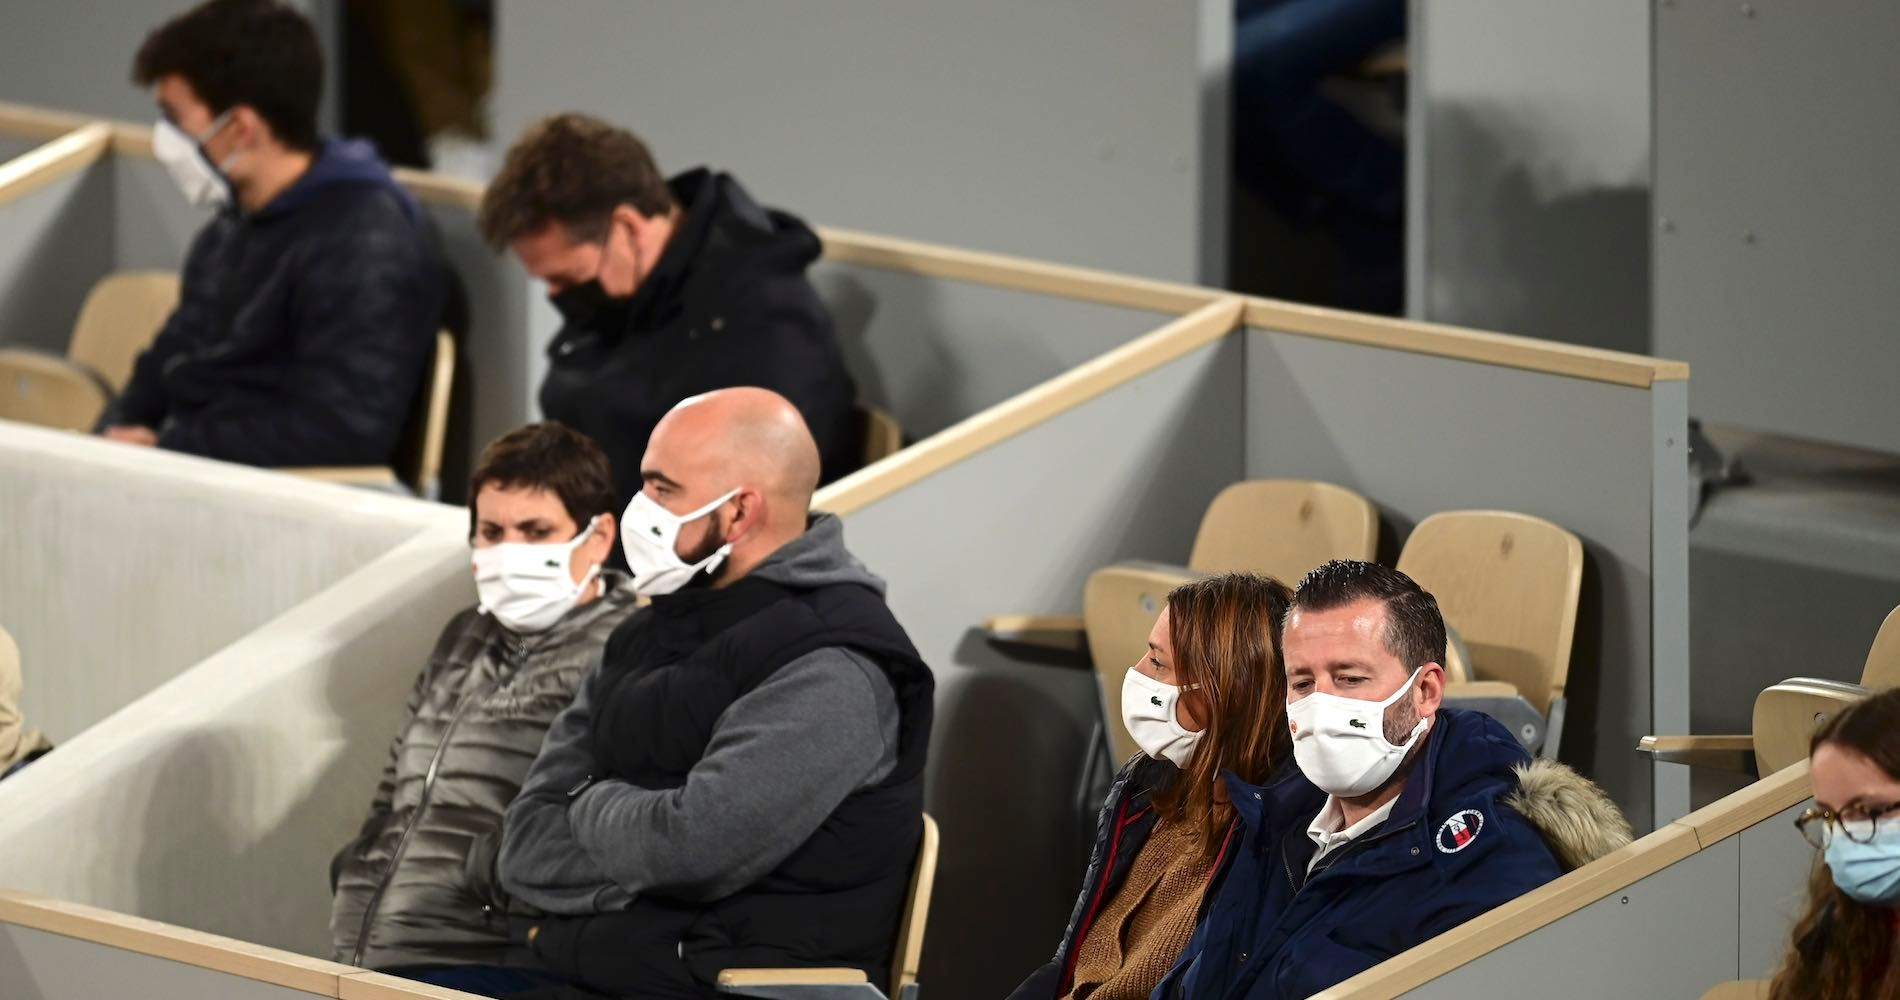 Roland-Garros 2020, audience